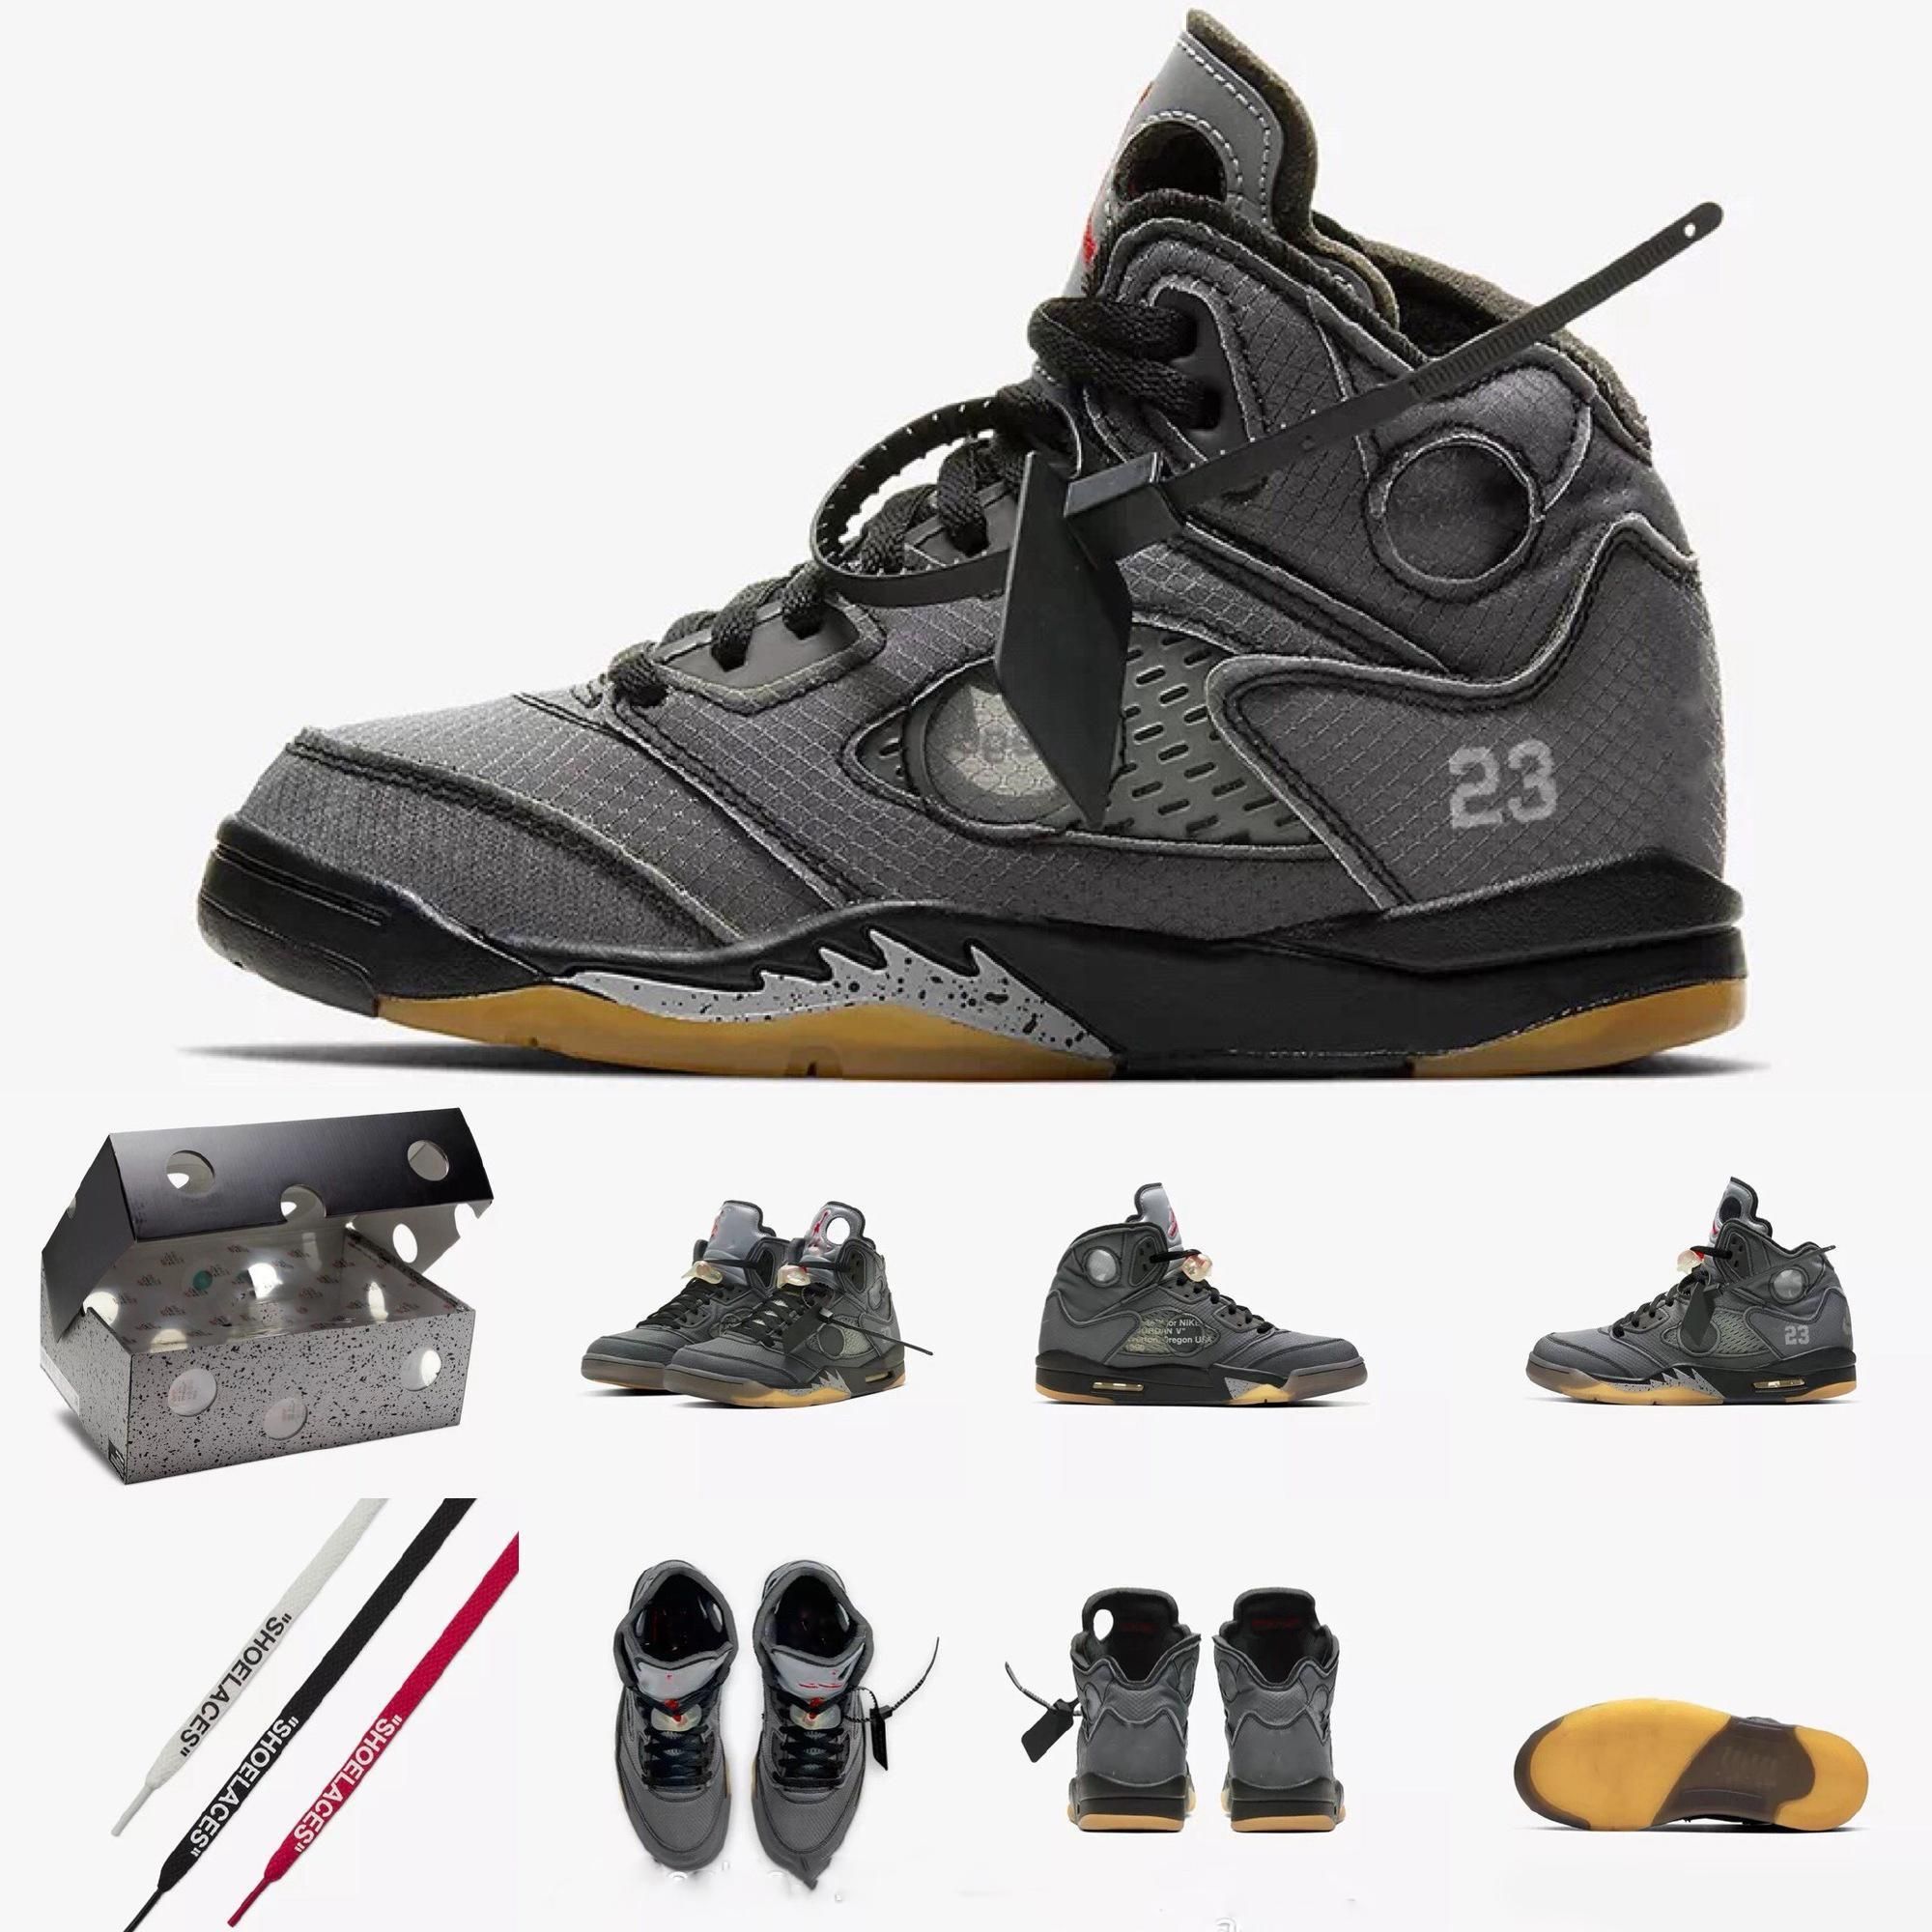 Nike Air Max Retro Jordan Shoes Mens Basketball Обувь OG ИОРДАНИЯ NakeskinИорданияРетро крем Jumpman 5 5s 3M Металлические Sail Светоотражающие Муслин Огонь Спорт тапки